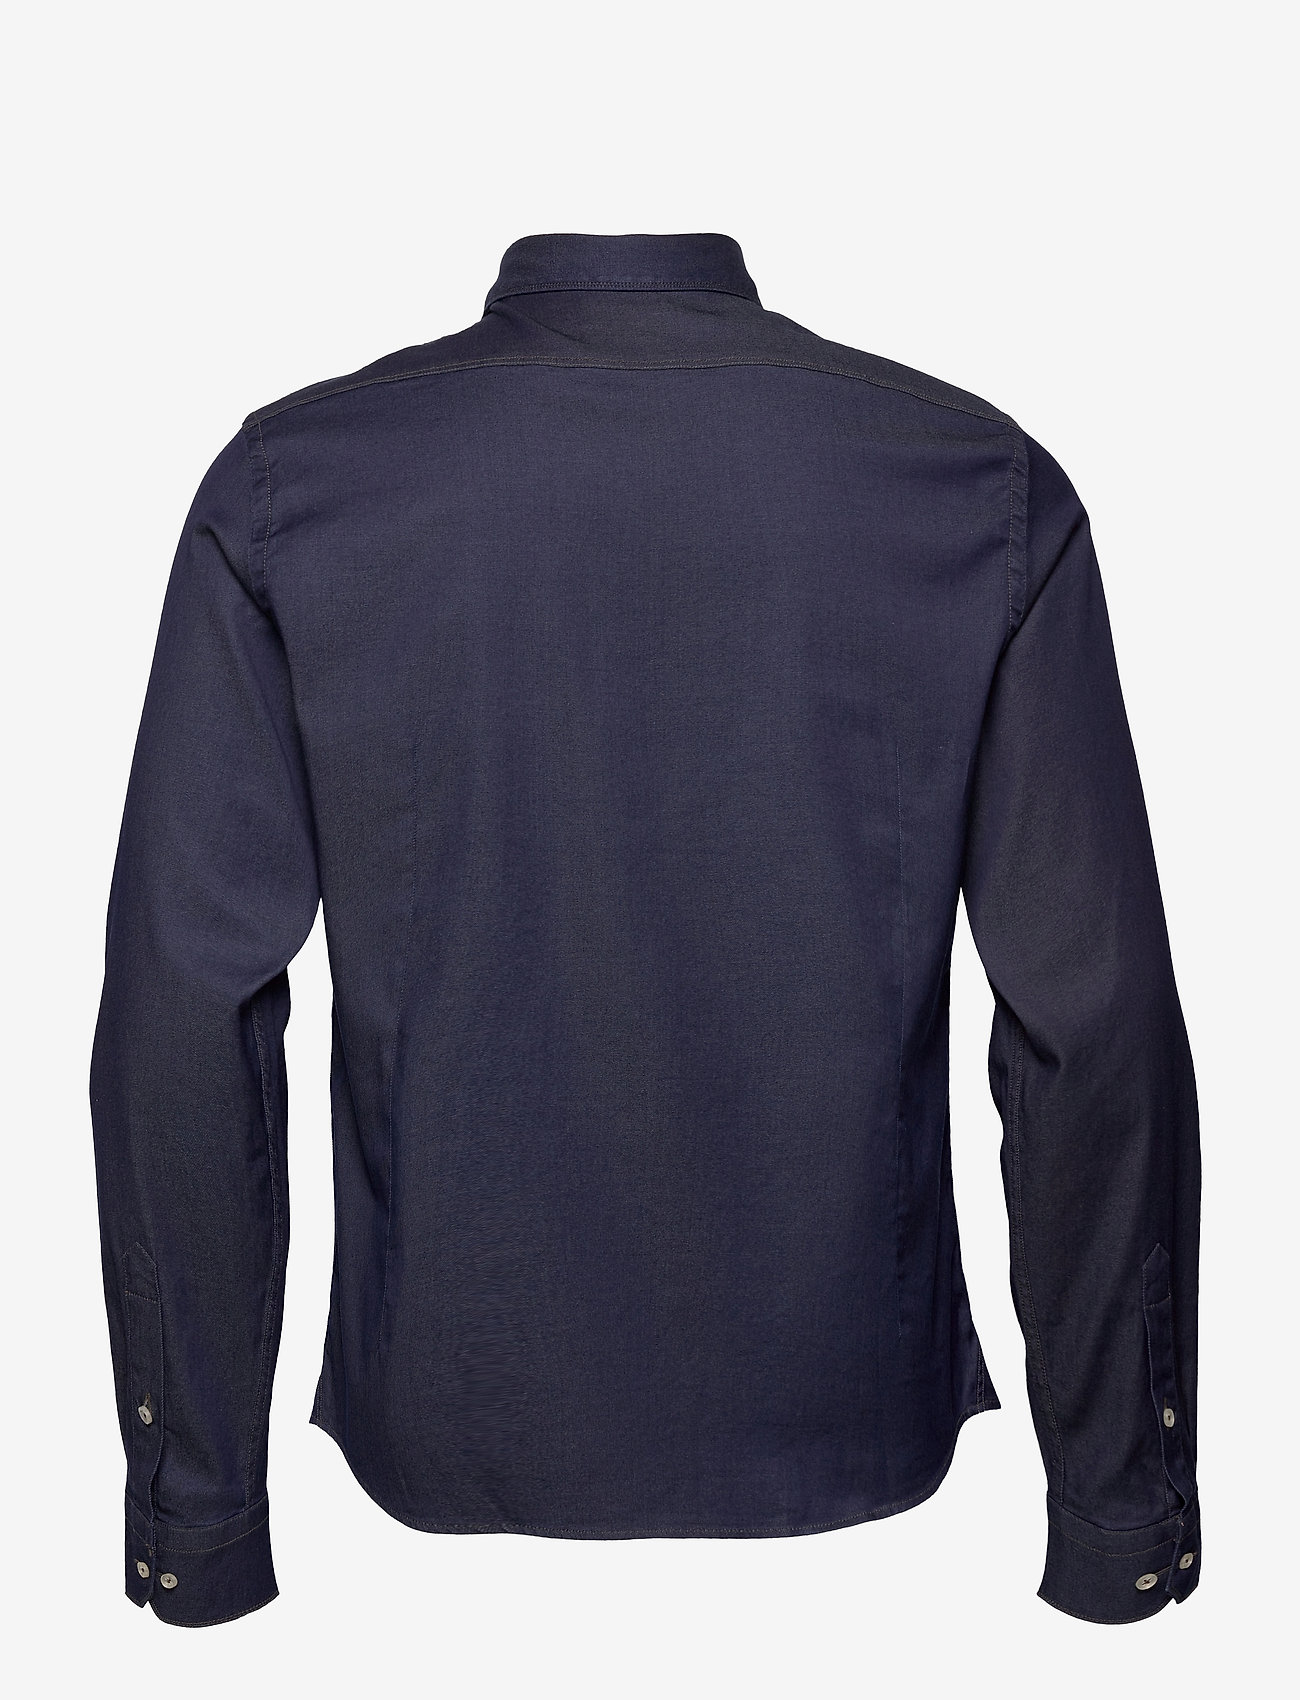 XO Shirtmaker by Sand Copenhagen - 8611 - Jacky SC - basic skjorter - medium blue - 1